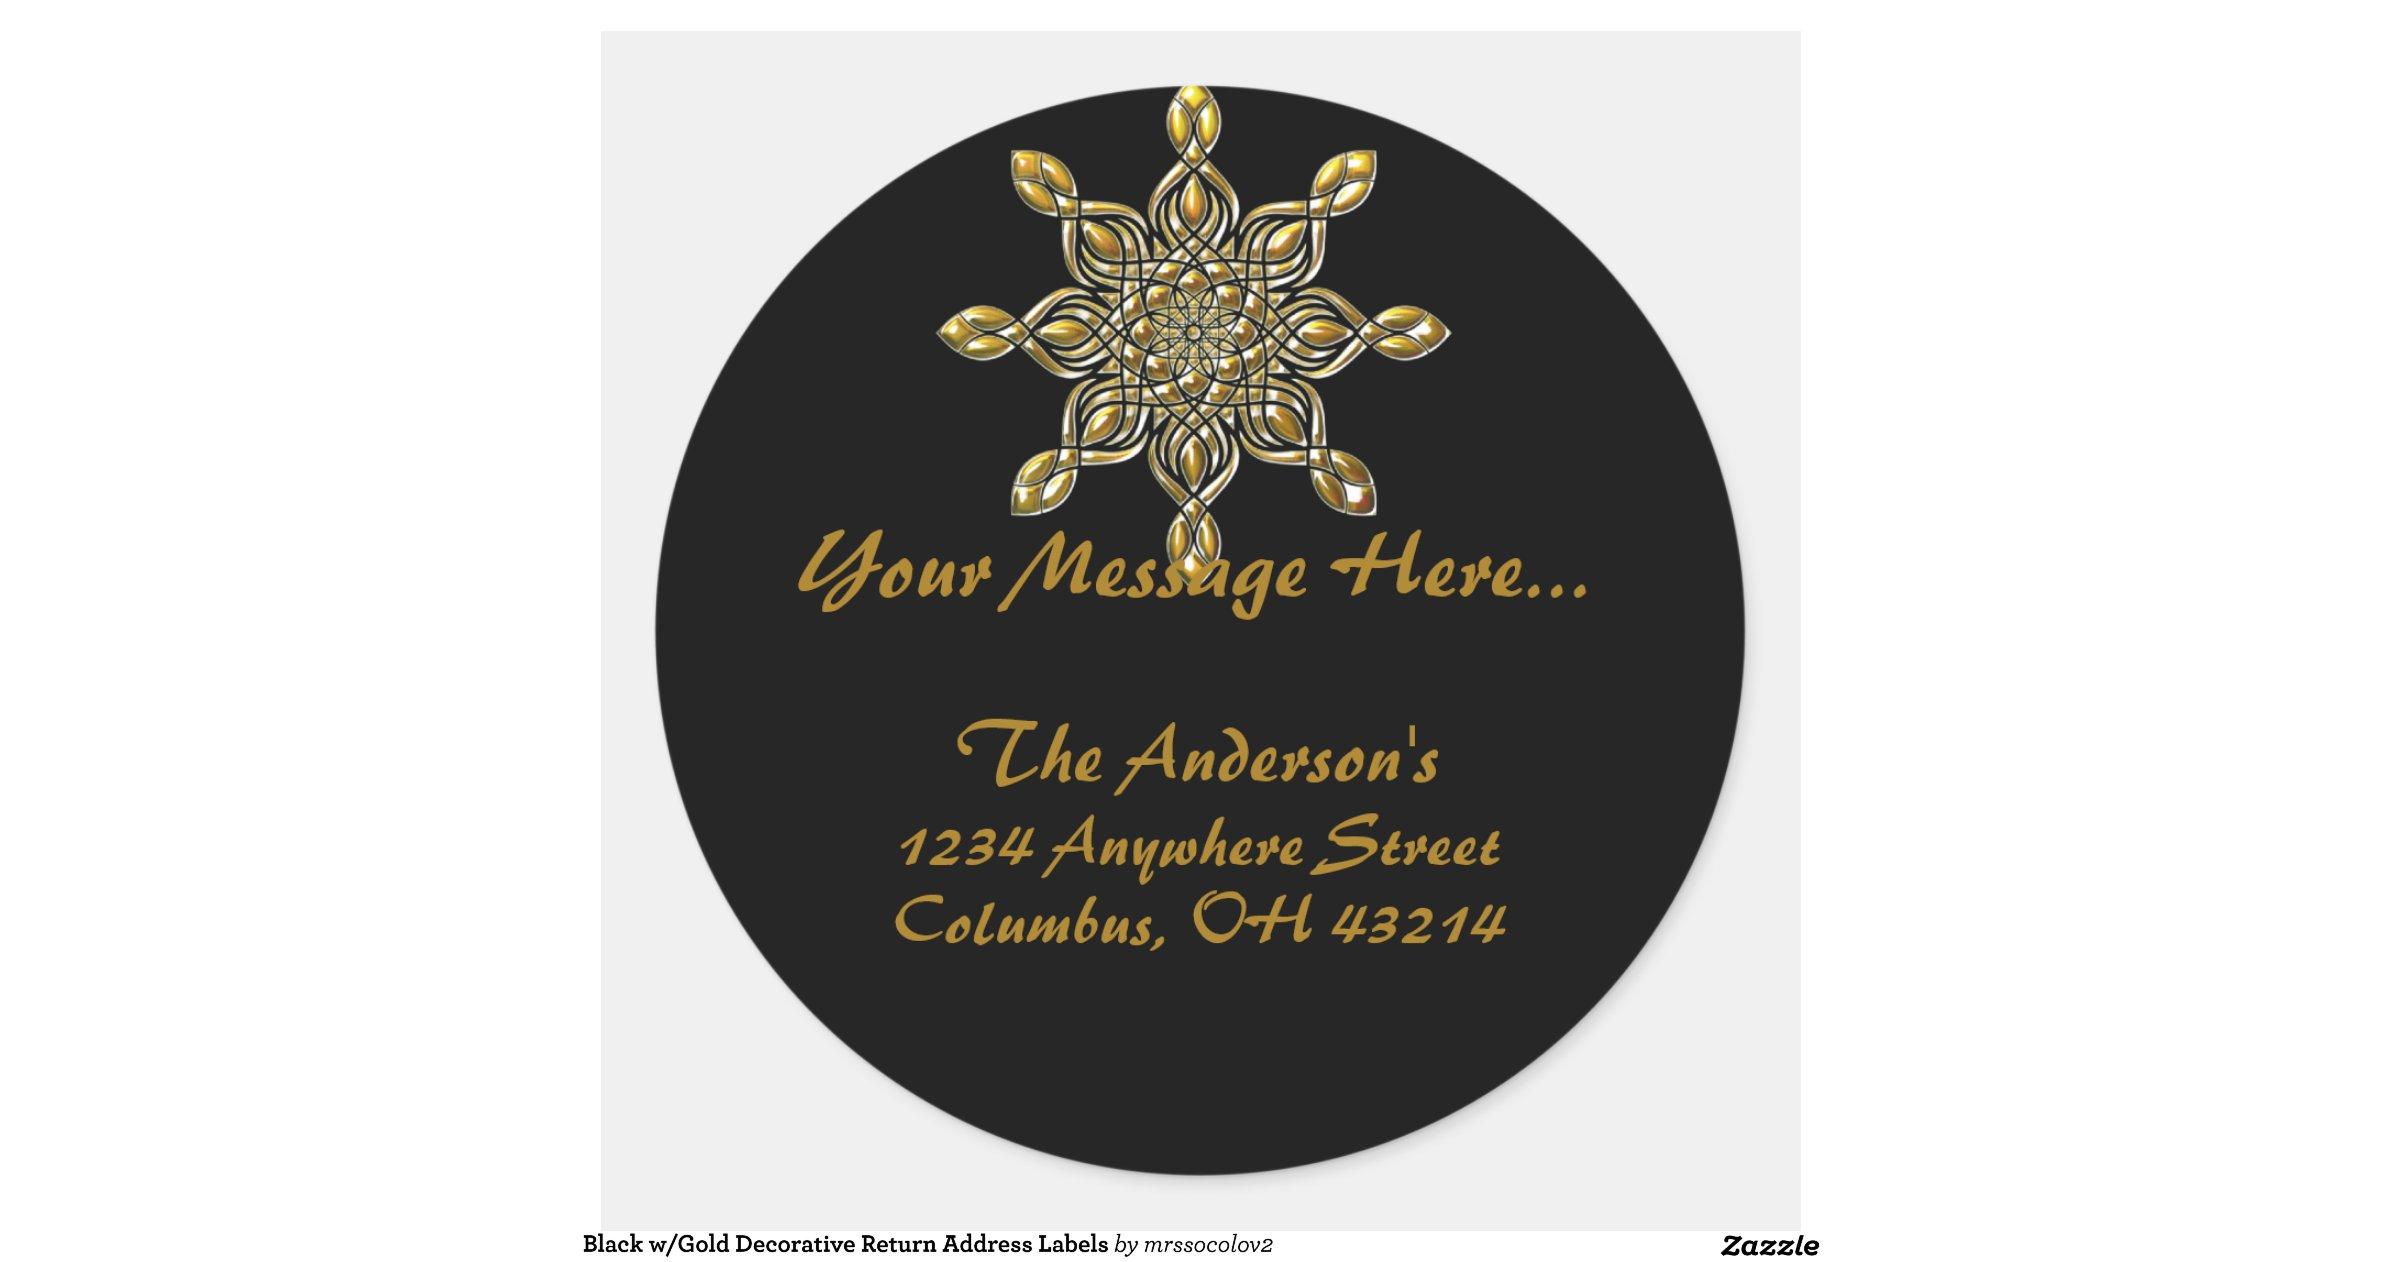 decorative return address labels black w gold decorative return